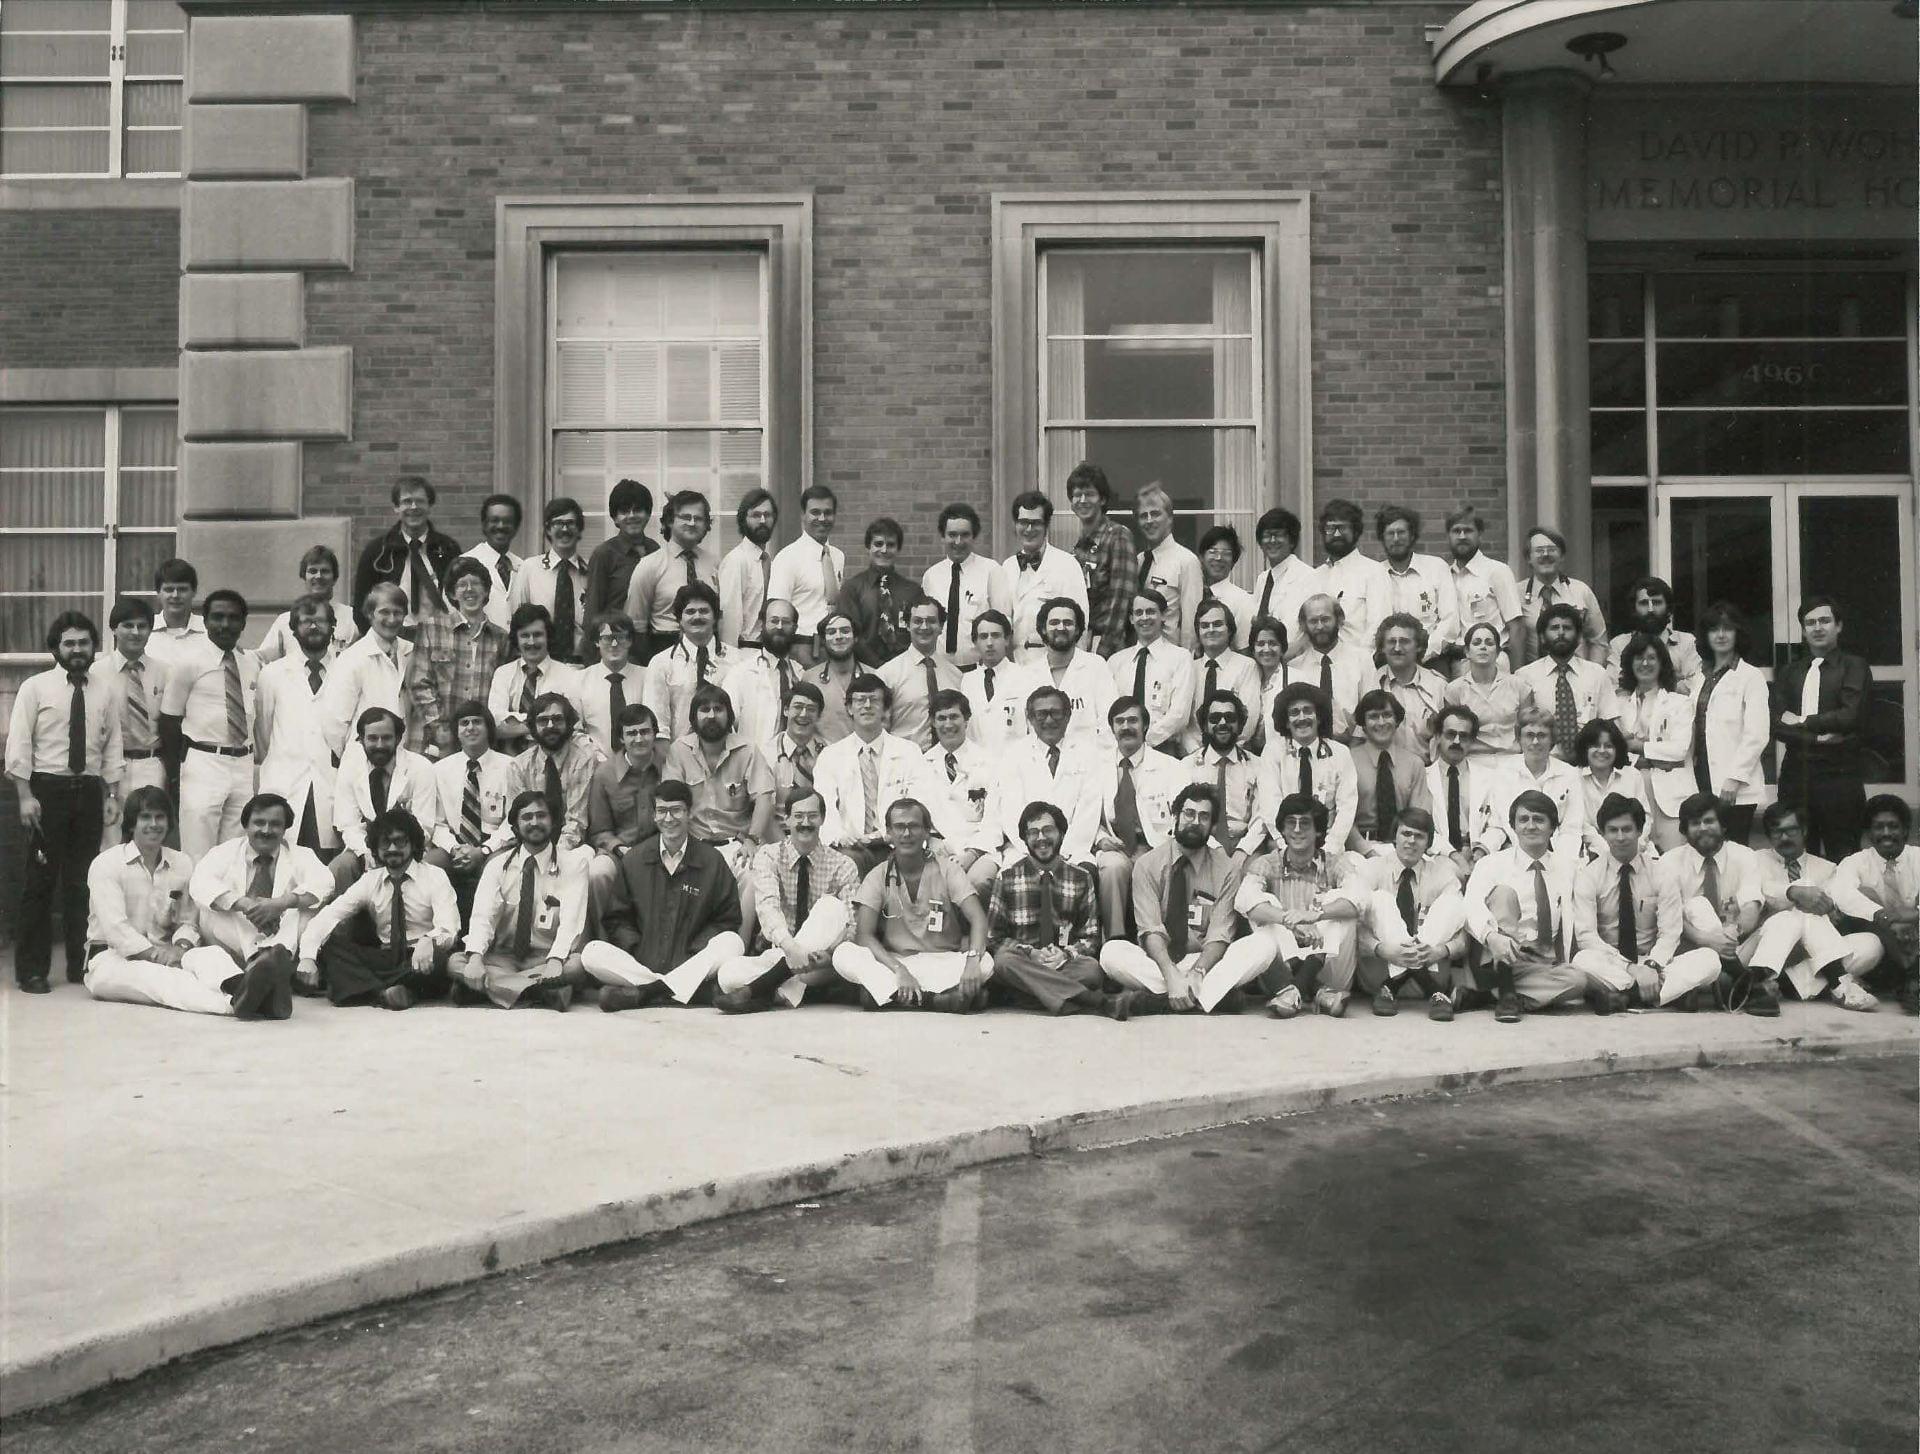 1980 Housestaff Photo